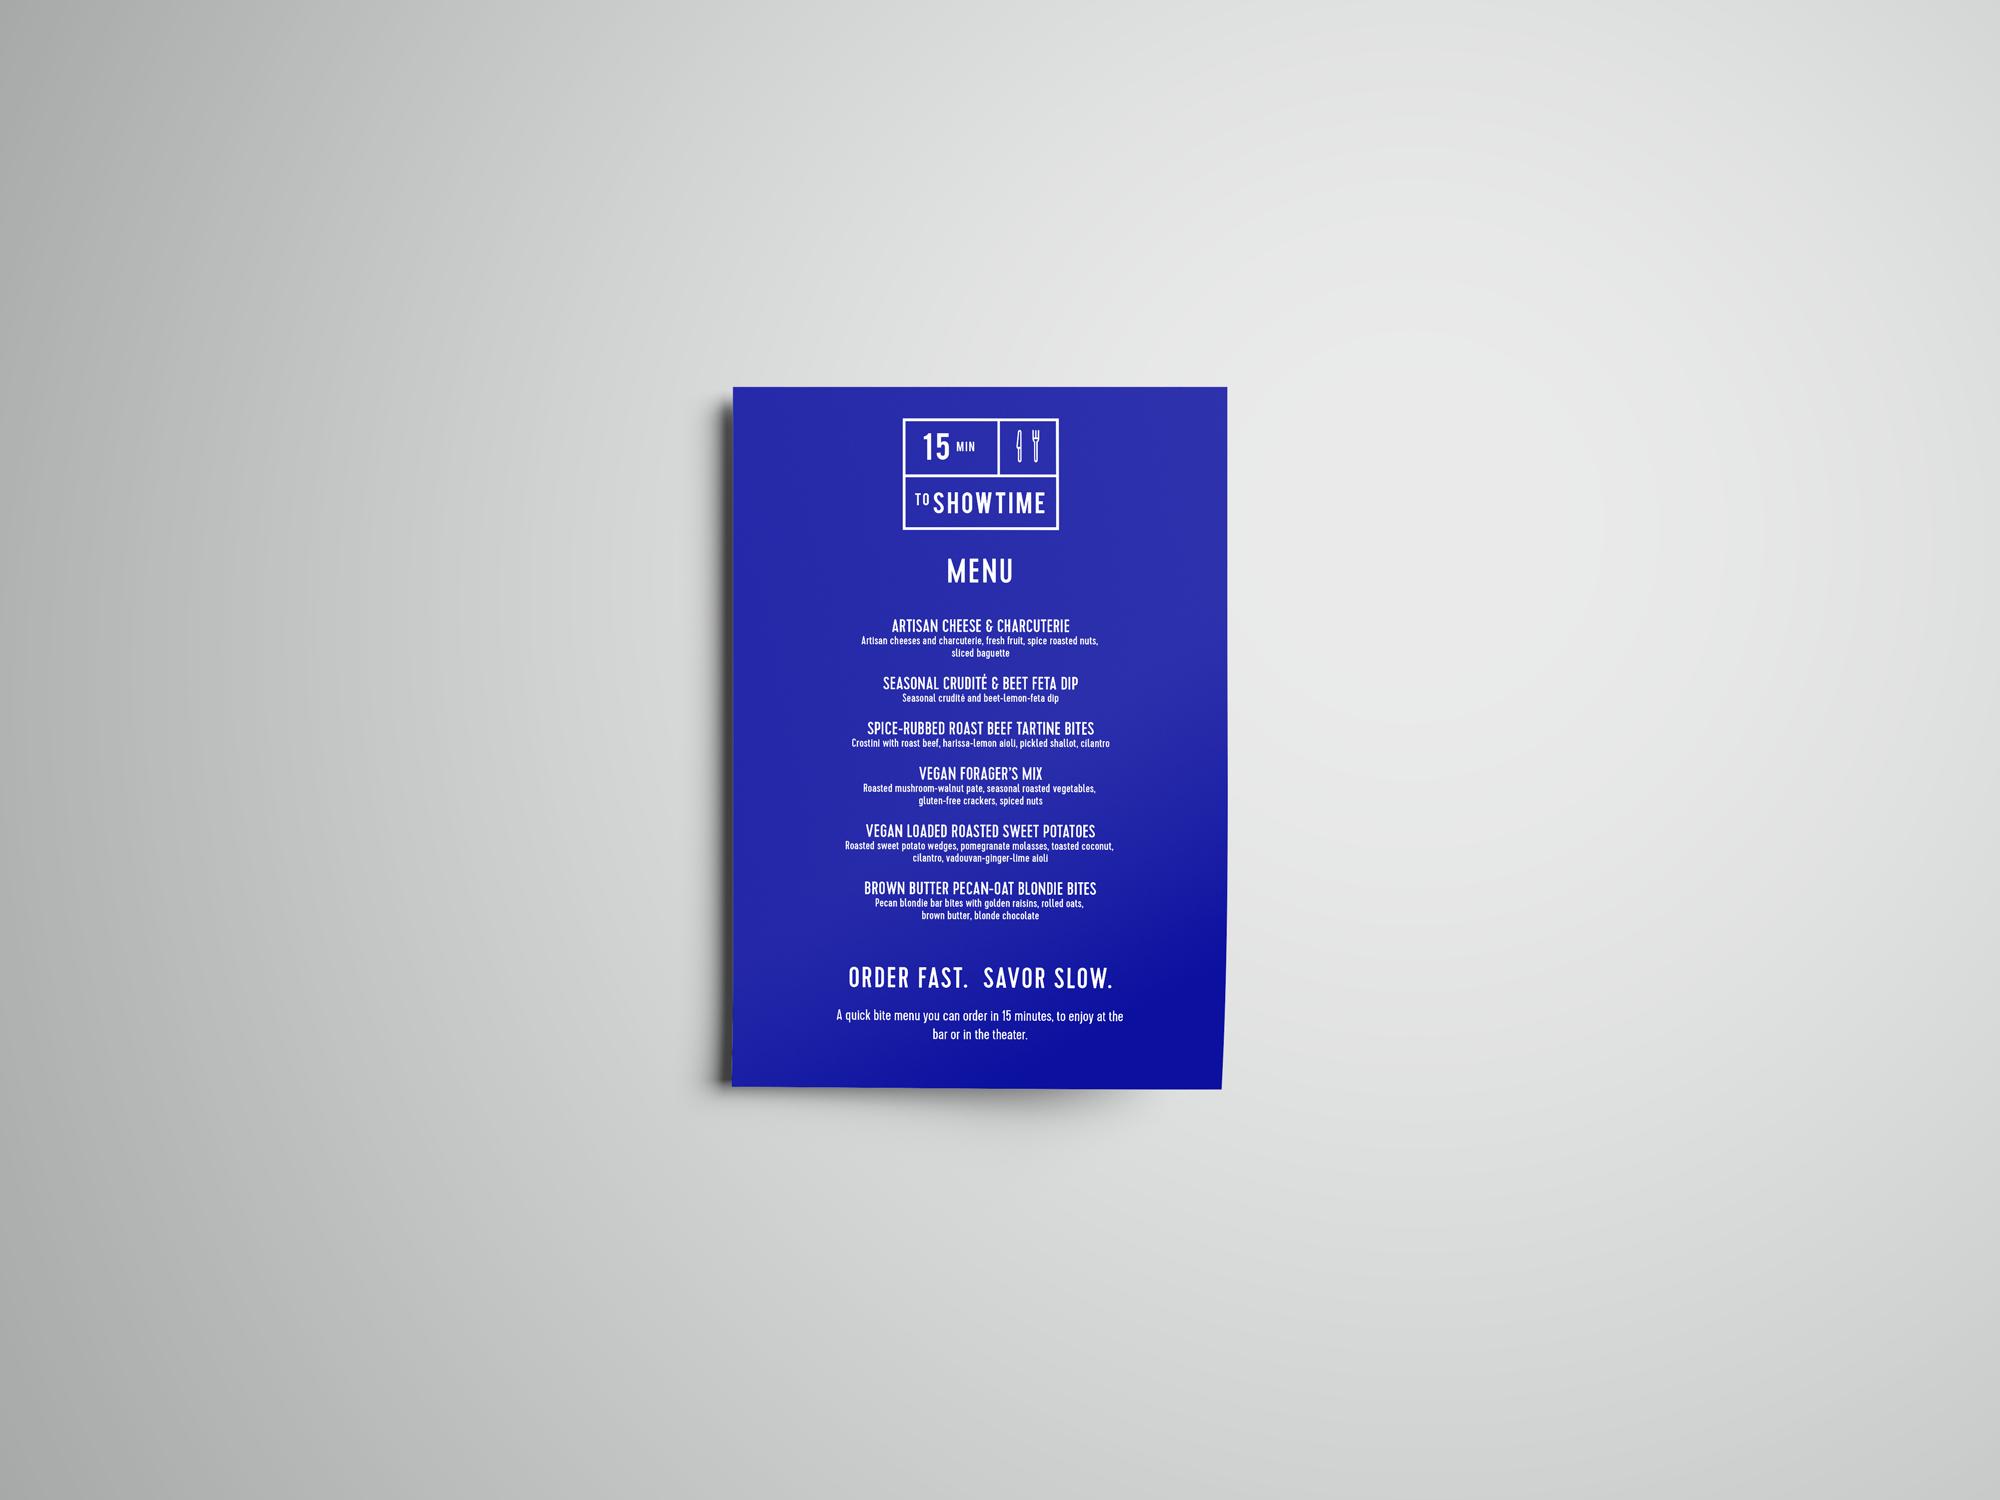 Free-Flyer-Mockup-2.png